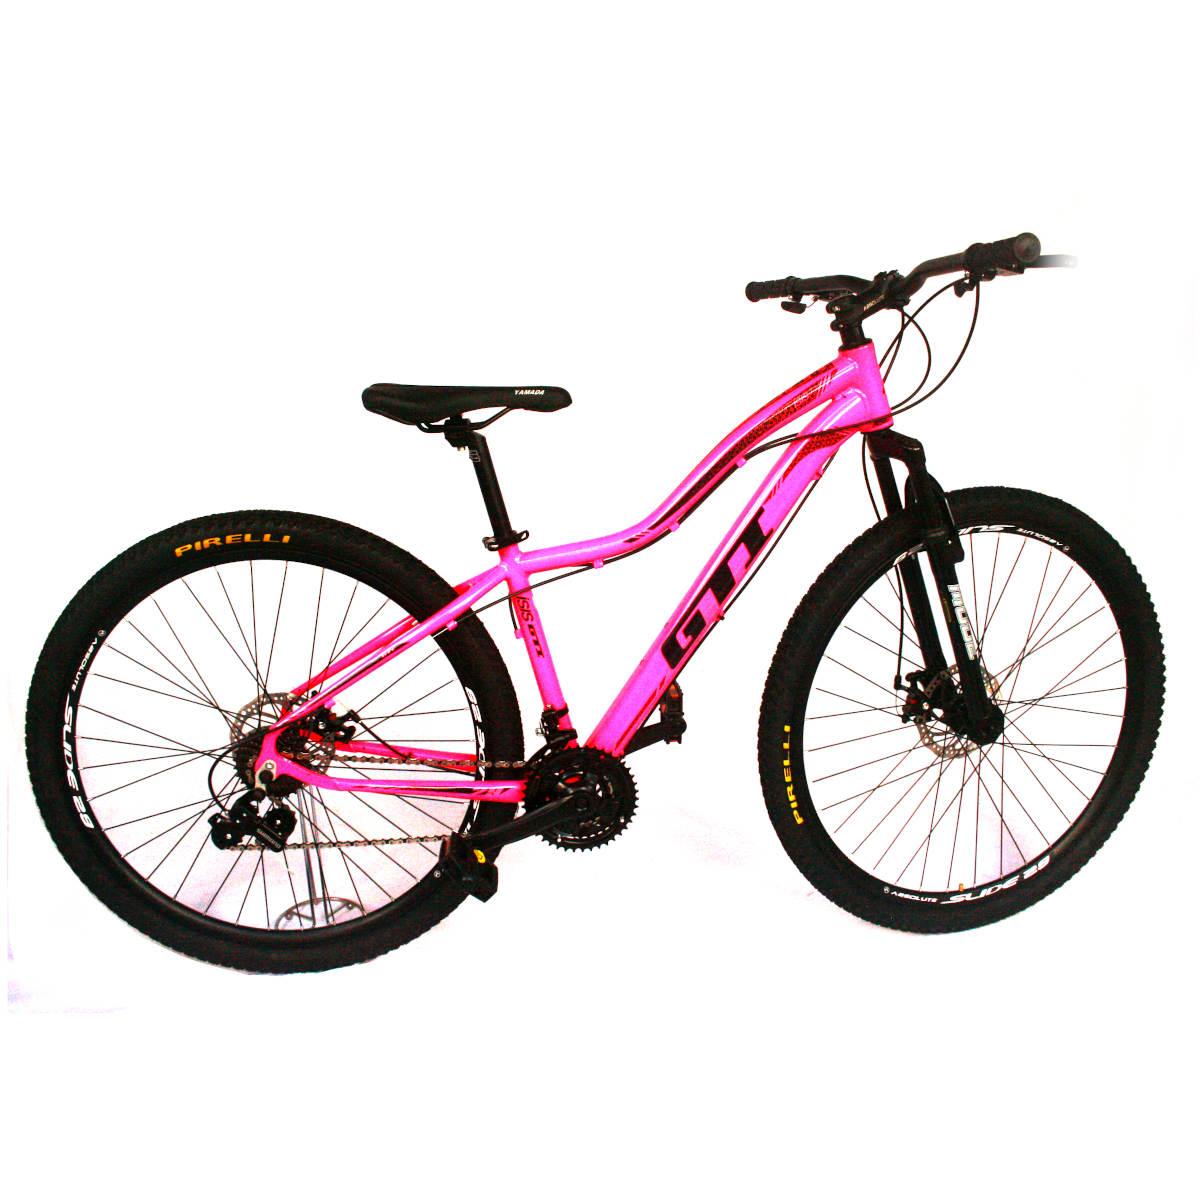 Bicicleta GTI ISIS  Aro 29 Feminina  ROSA